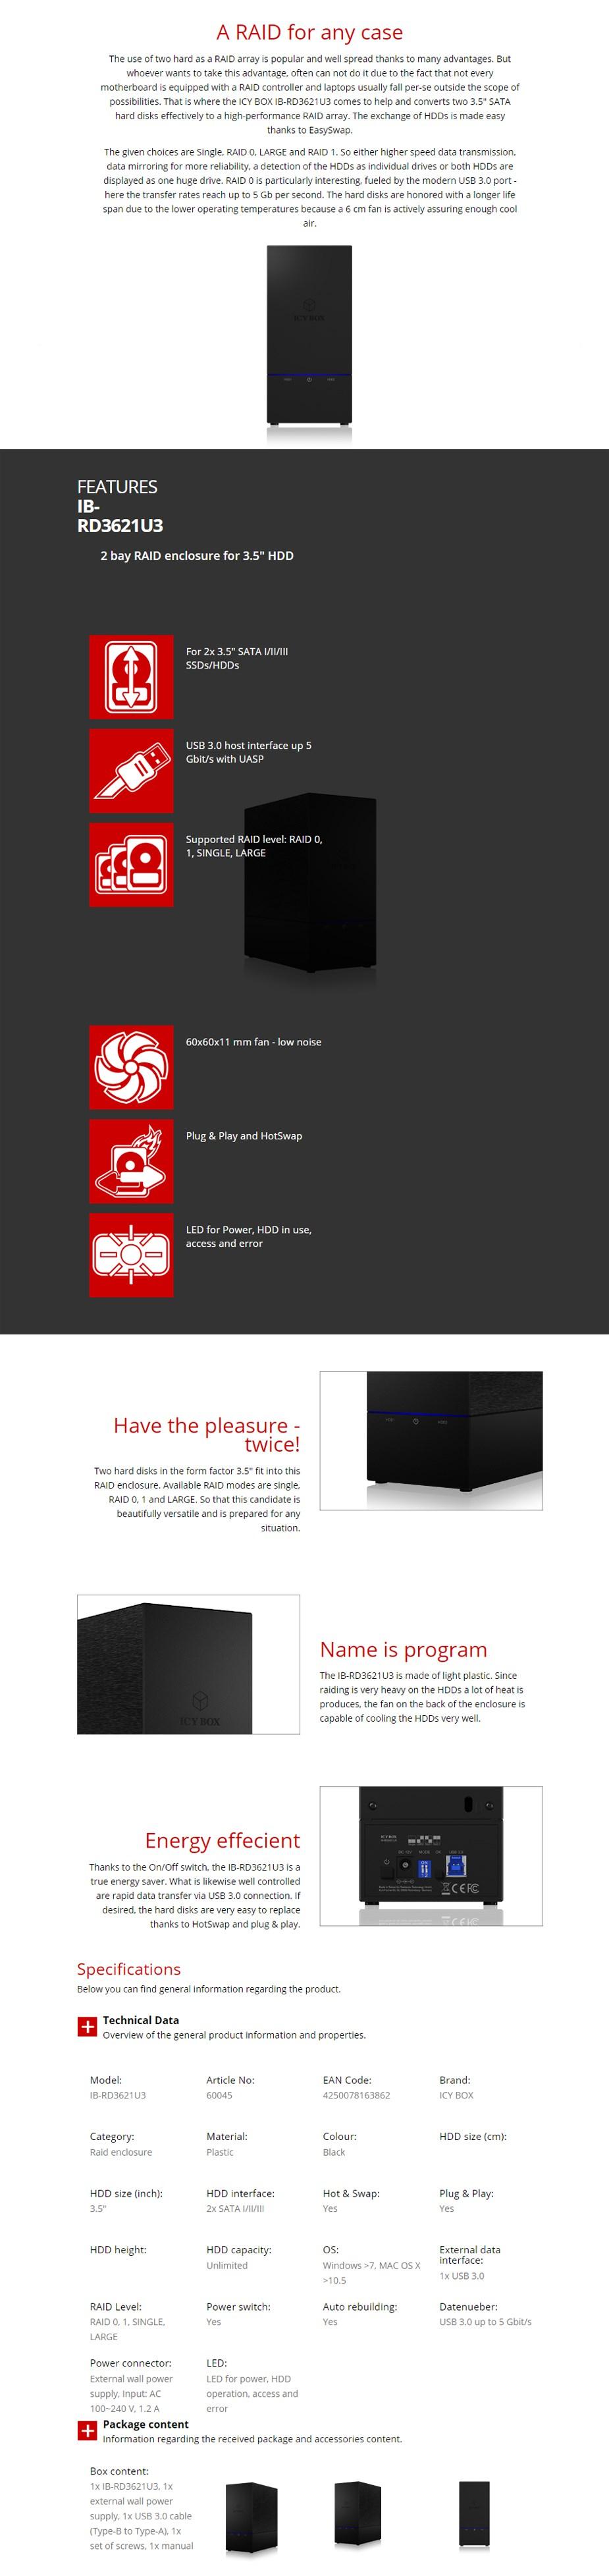 "ICY BOX IB-RD3621U3 2 Bay Diskless External RAID Enclosure for 3.5"" - Overview 1"